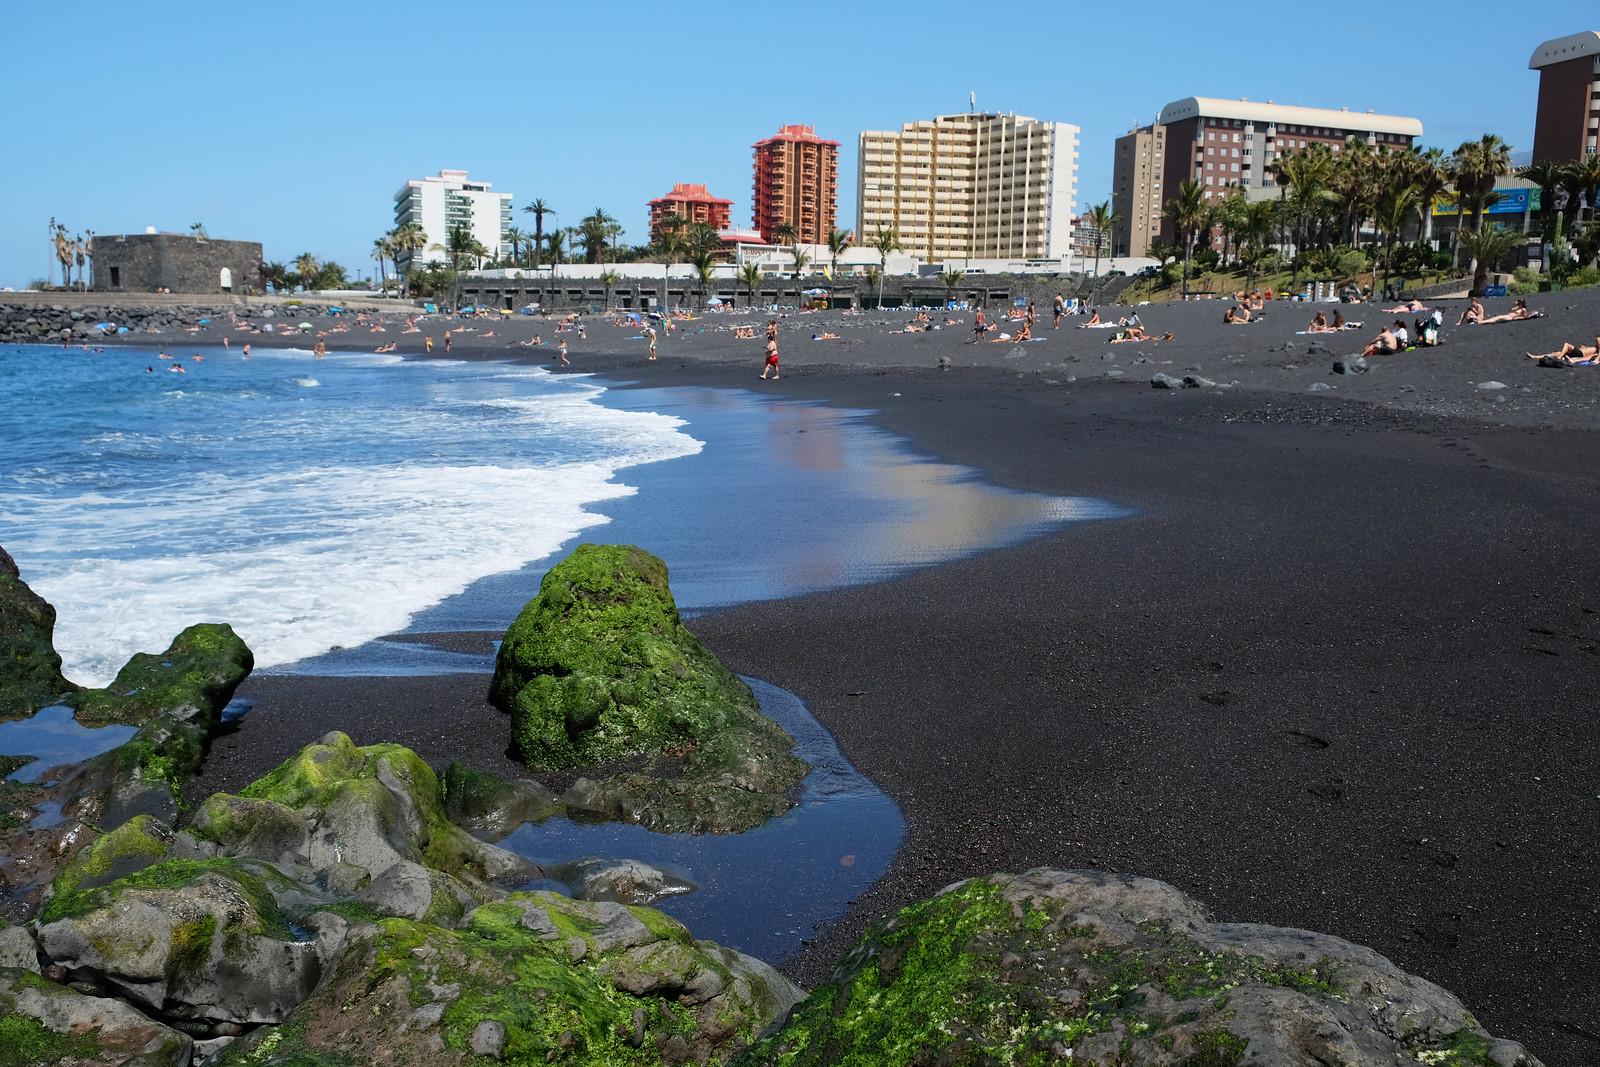 Playa Jardín, Puerto de la Cruz, Tenerife, Canary Islands, Spain